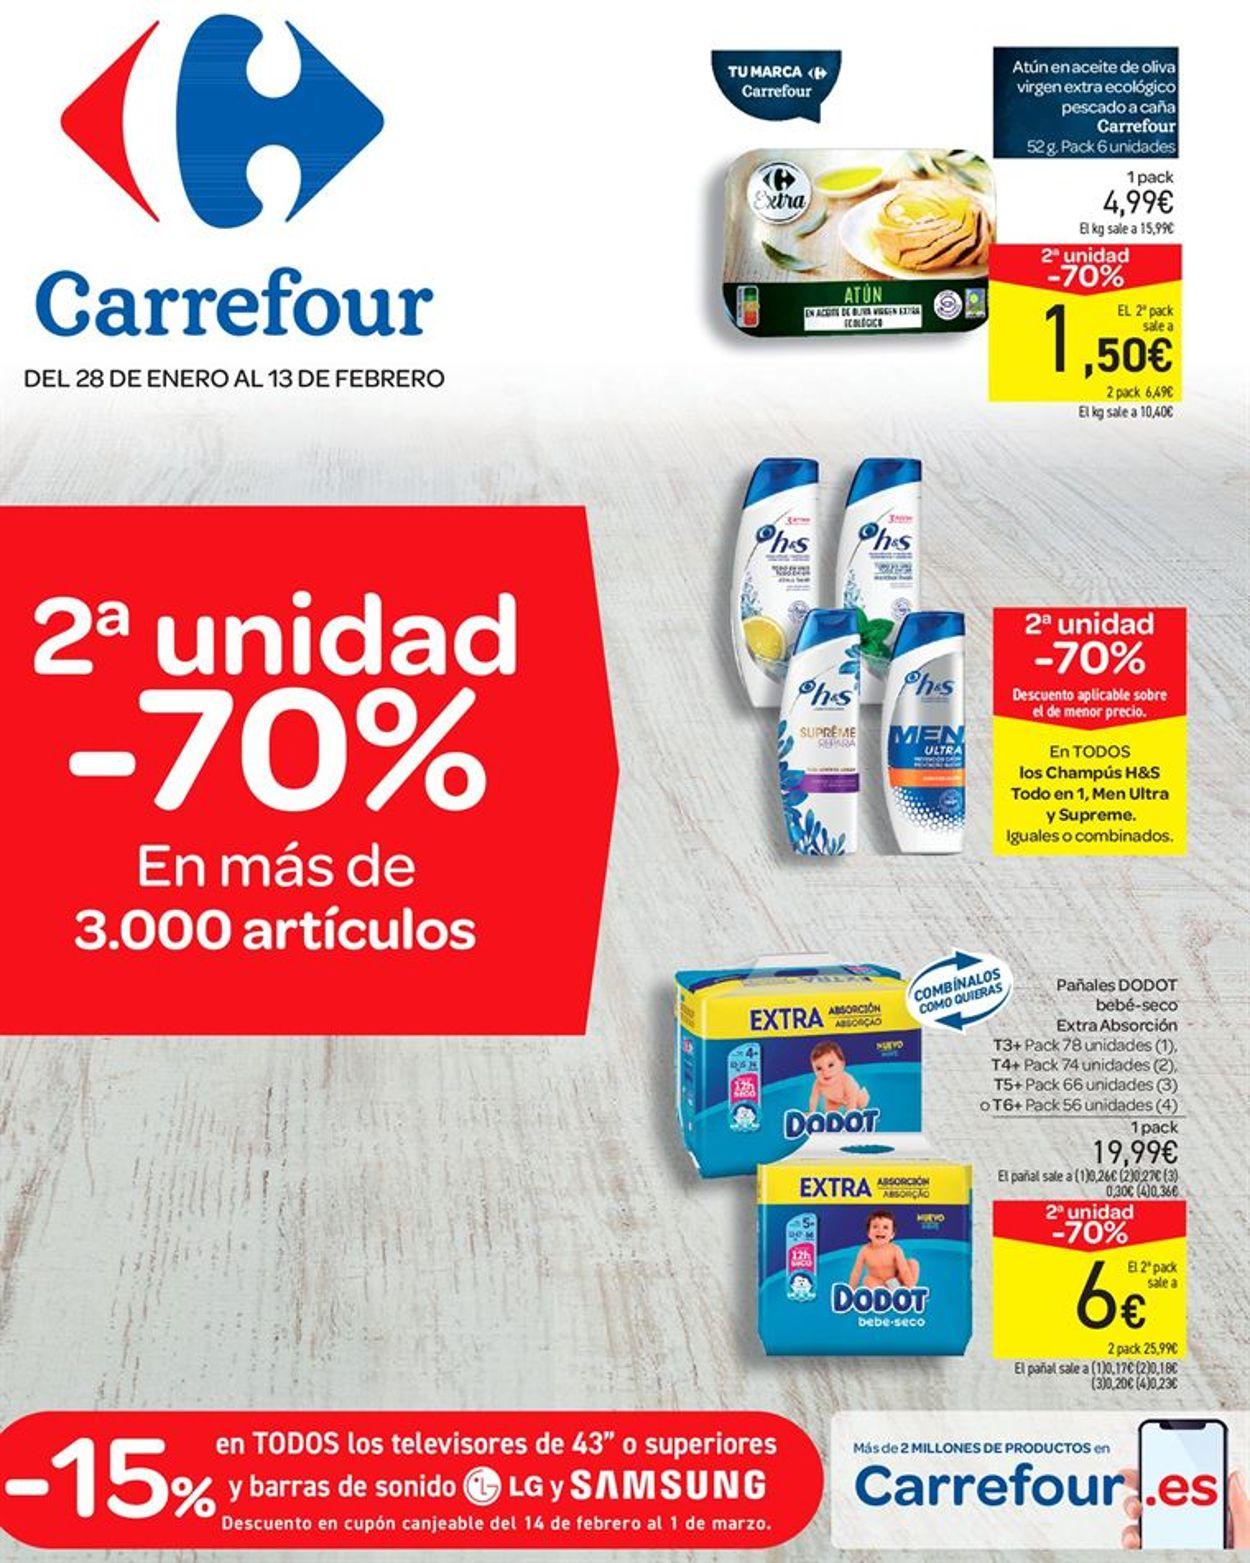 Carrefour Folleto - 28.01-13.02.2020